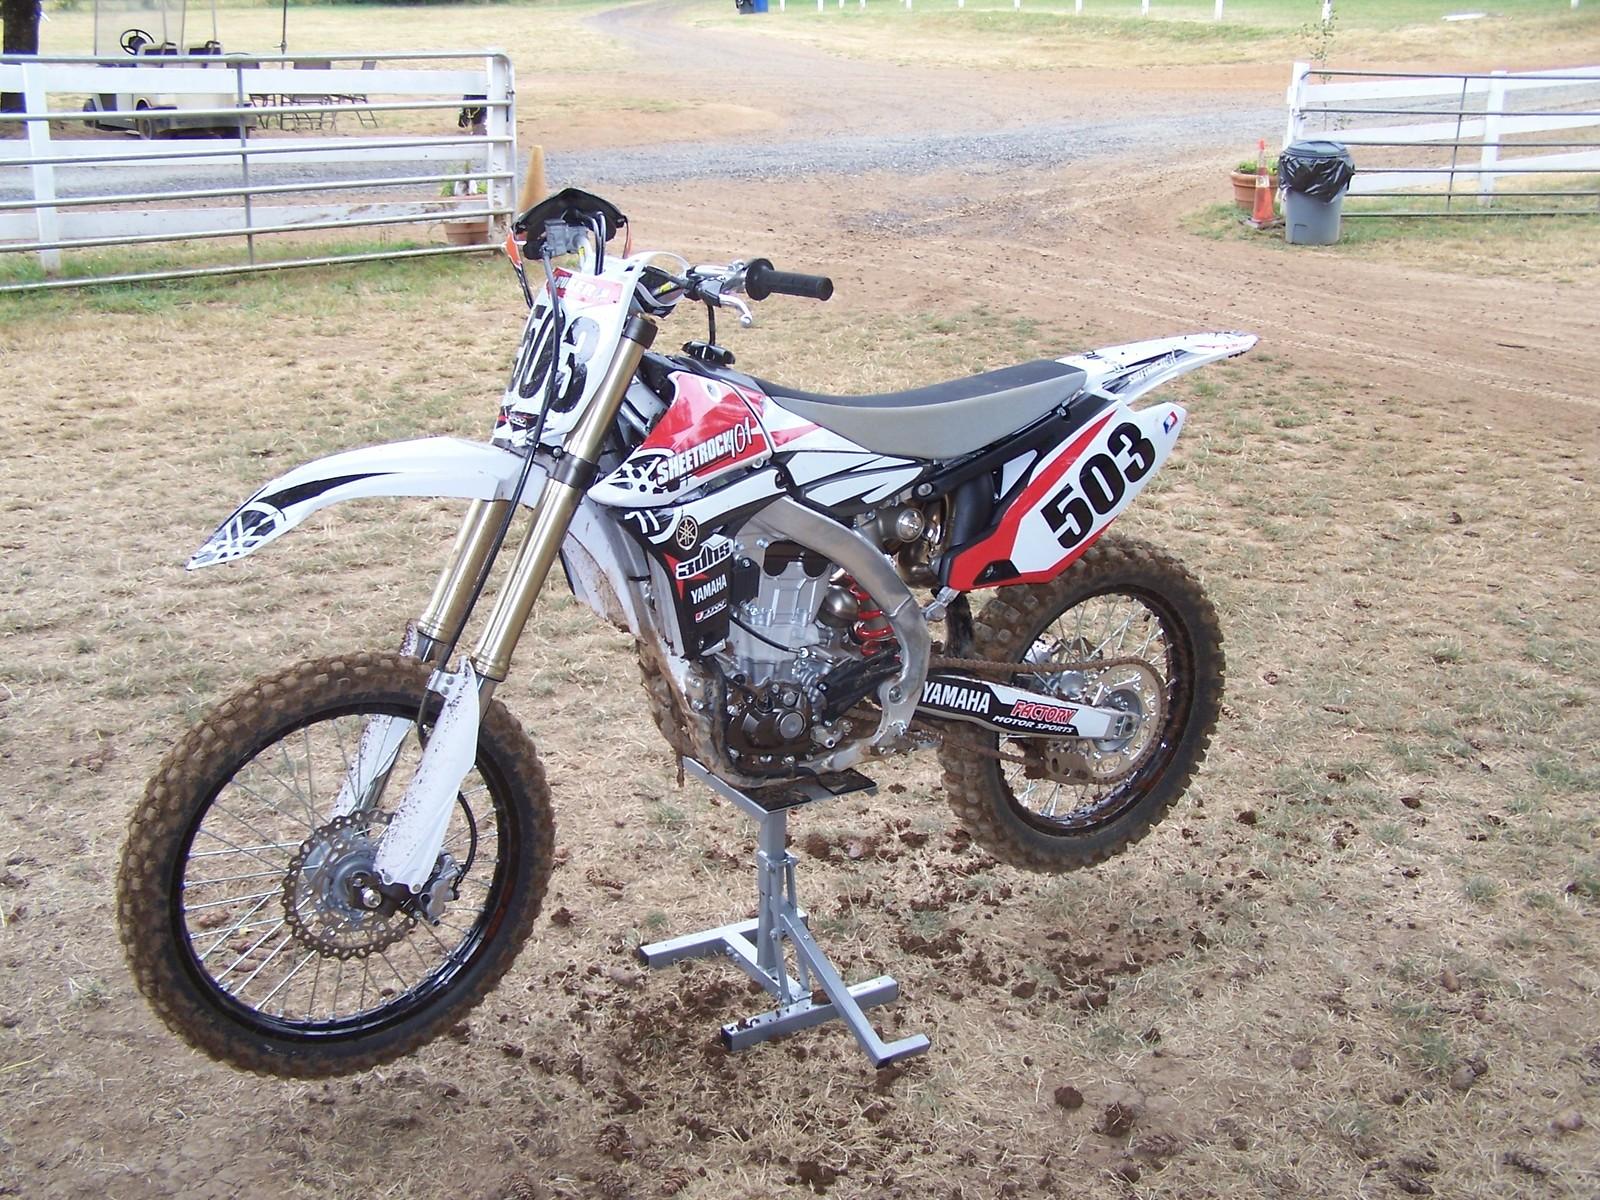 Huber YZ450F 3 - jeffro503 - Motocross Pictures - Vital MX